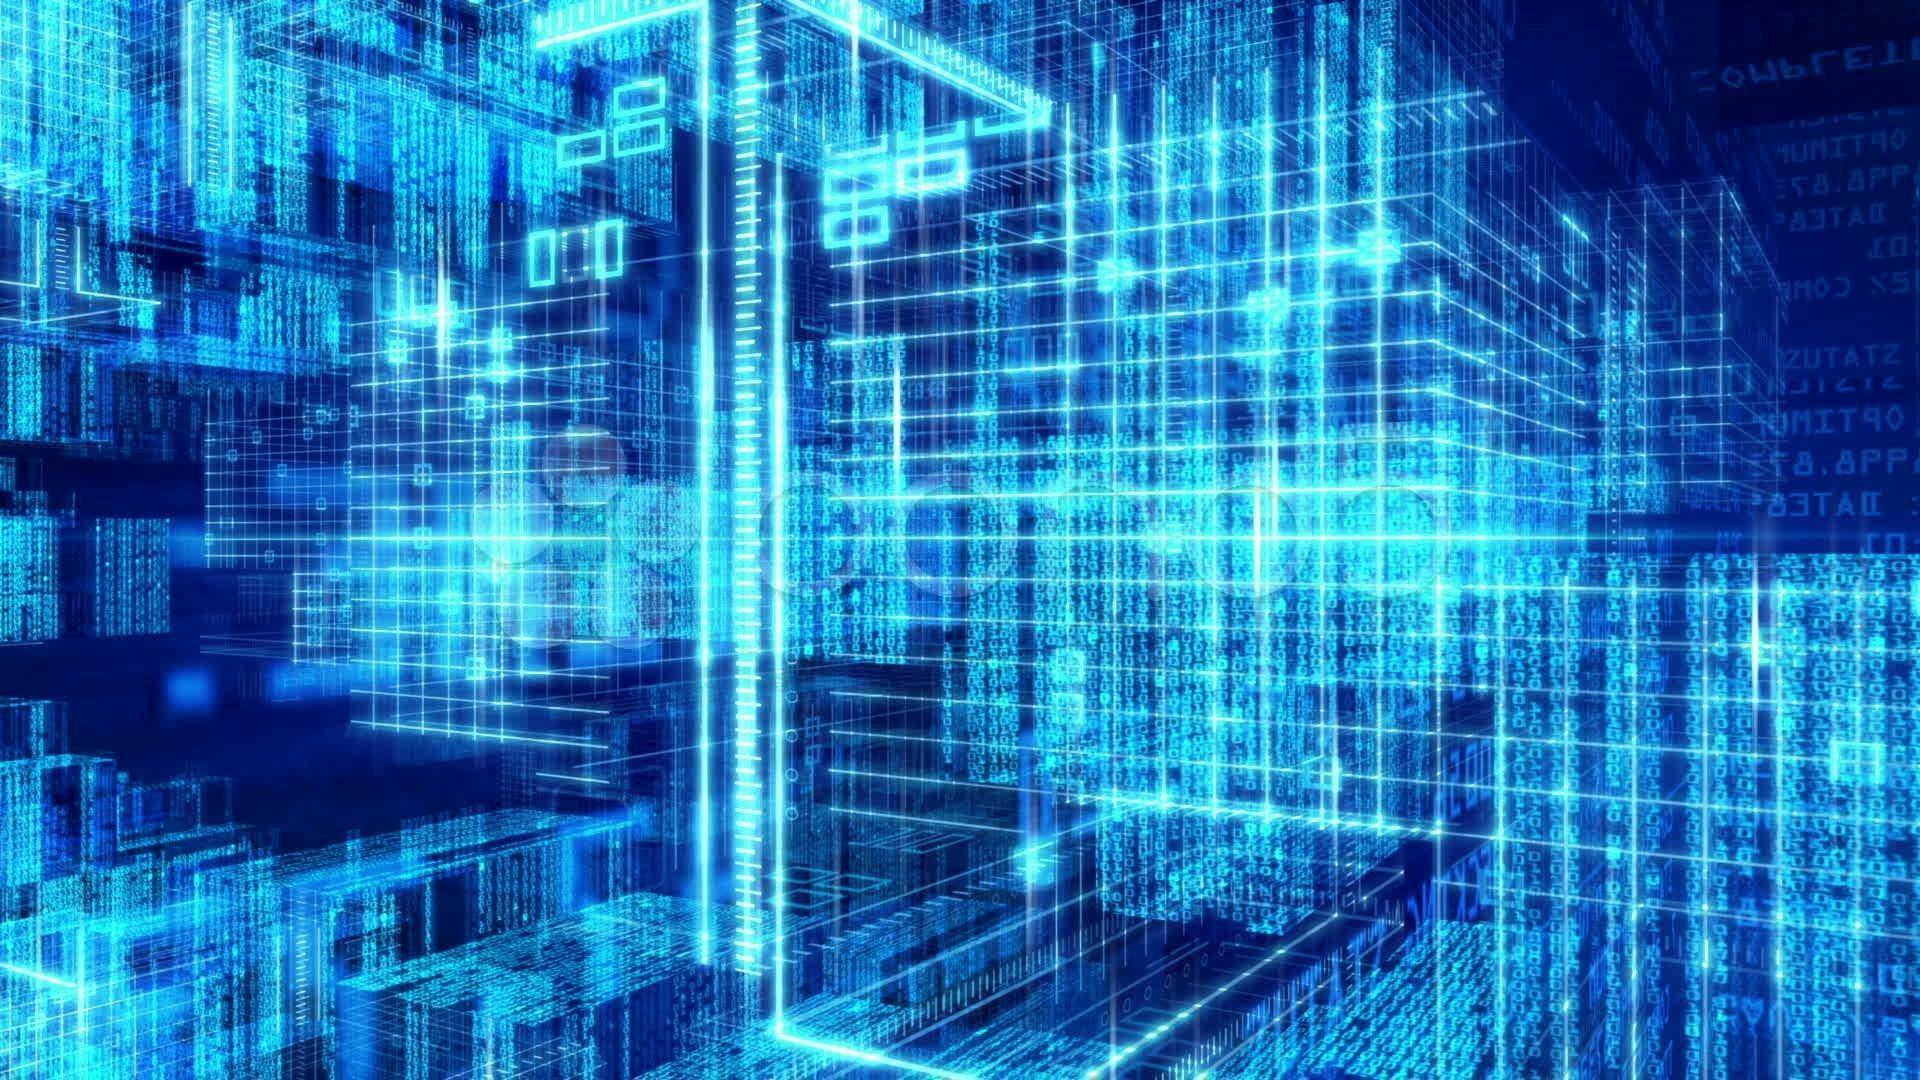 computer-science-wallpaper-HD5-600×338